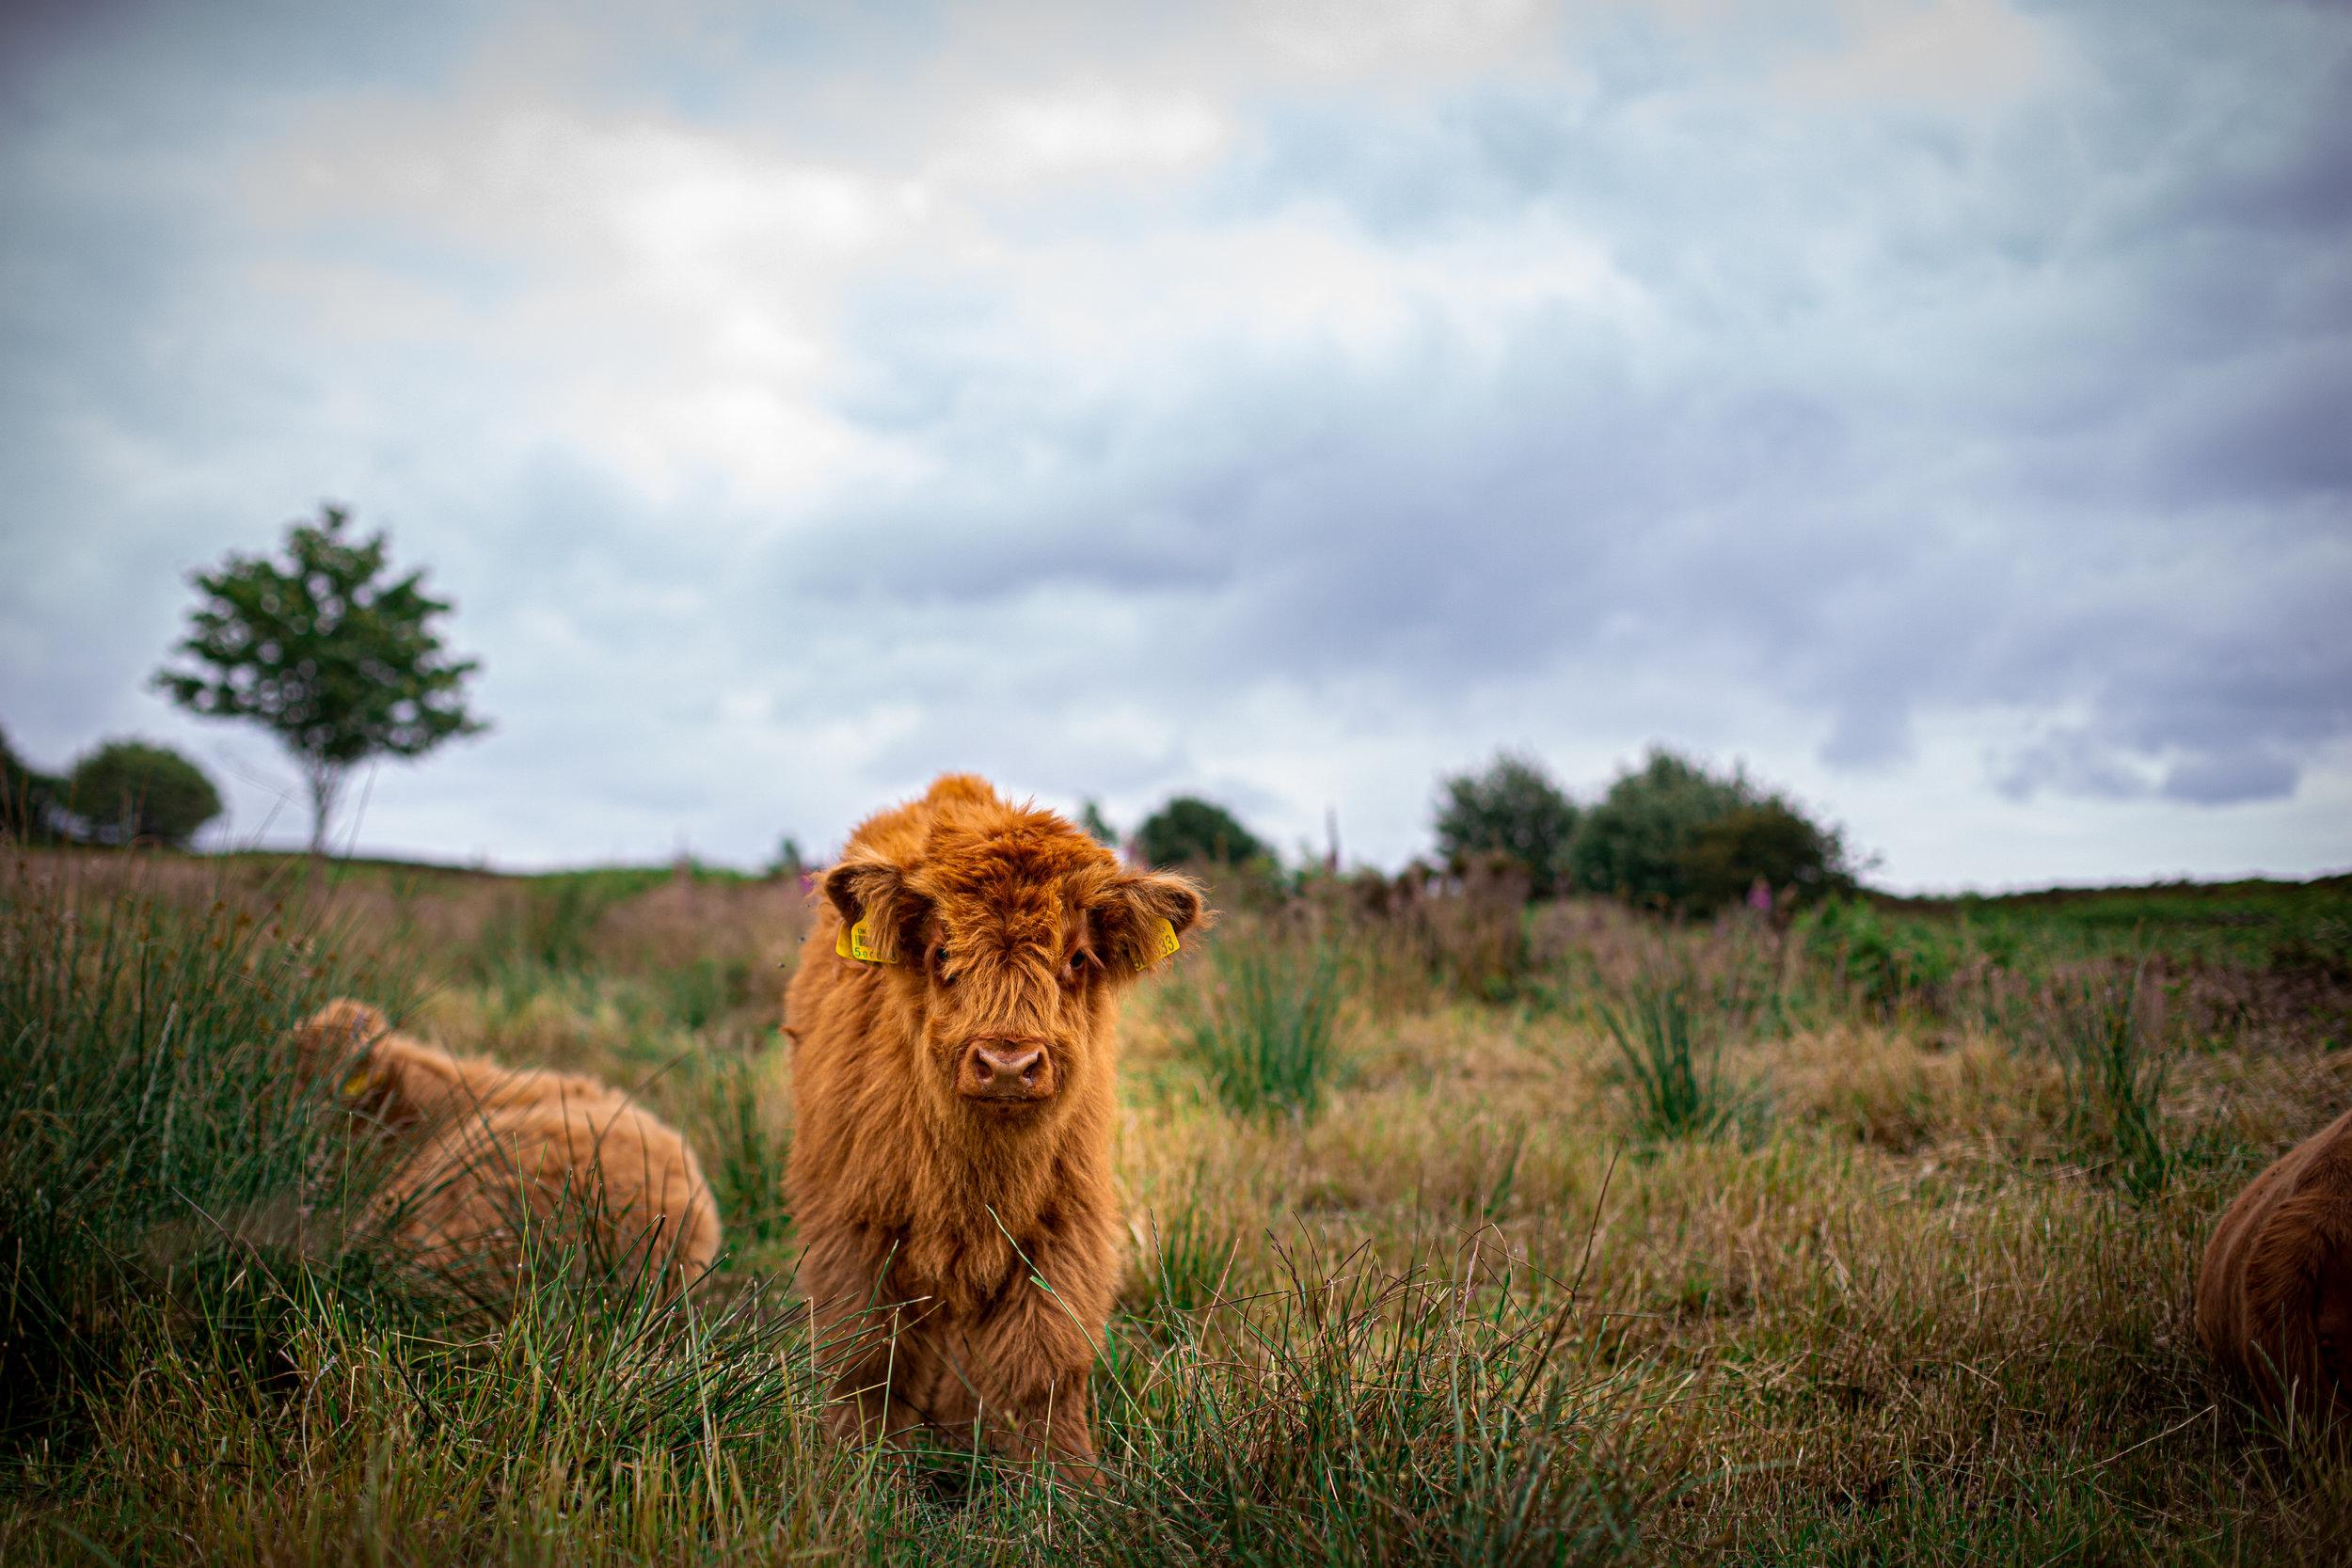 Cows-65.jpg